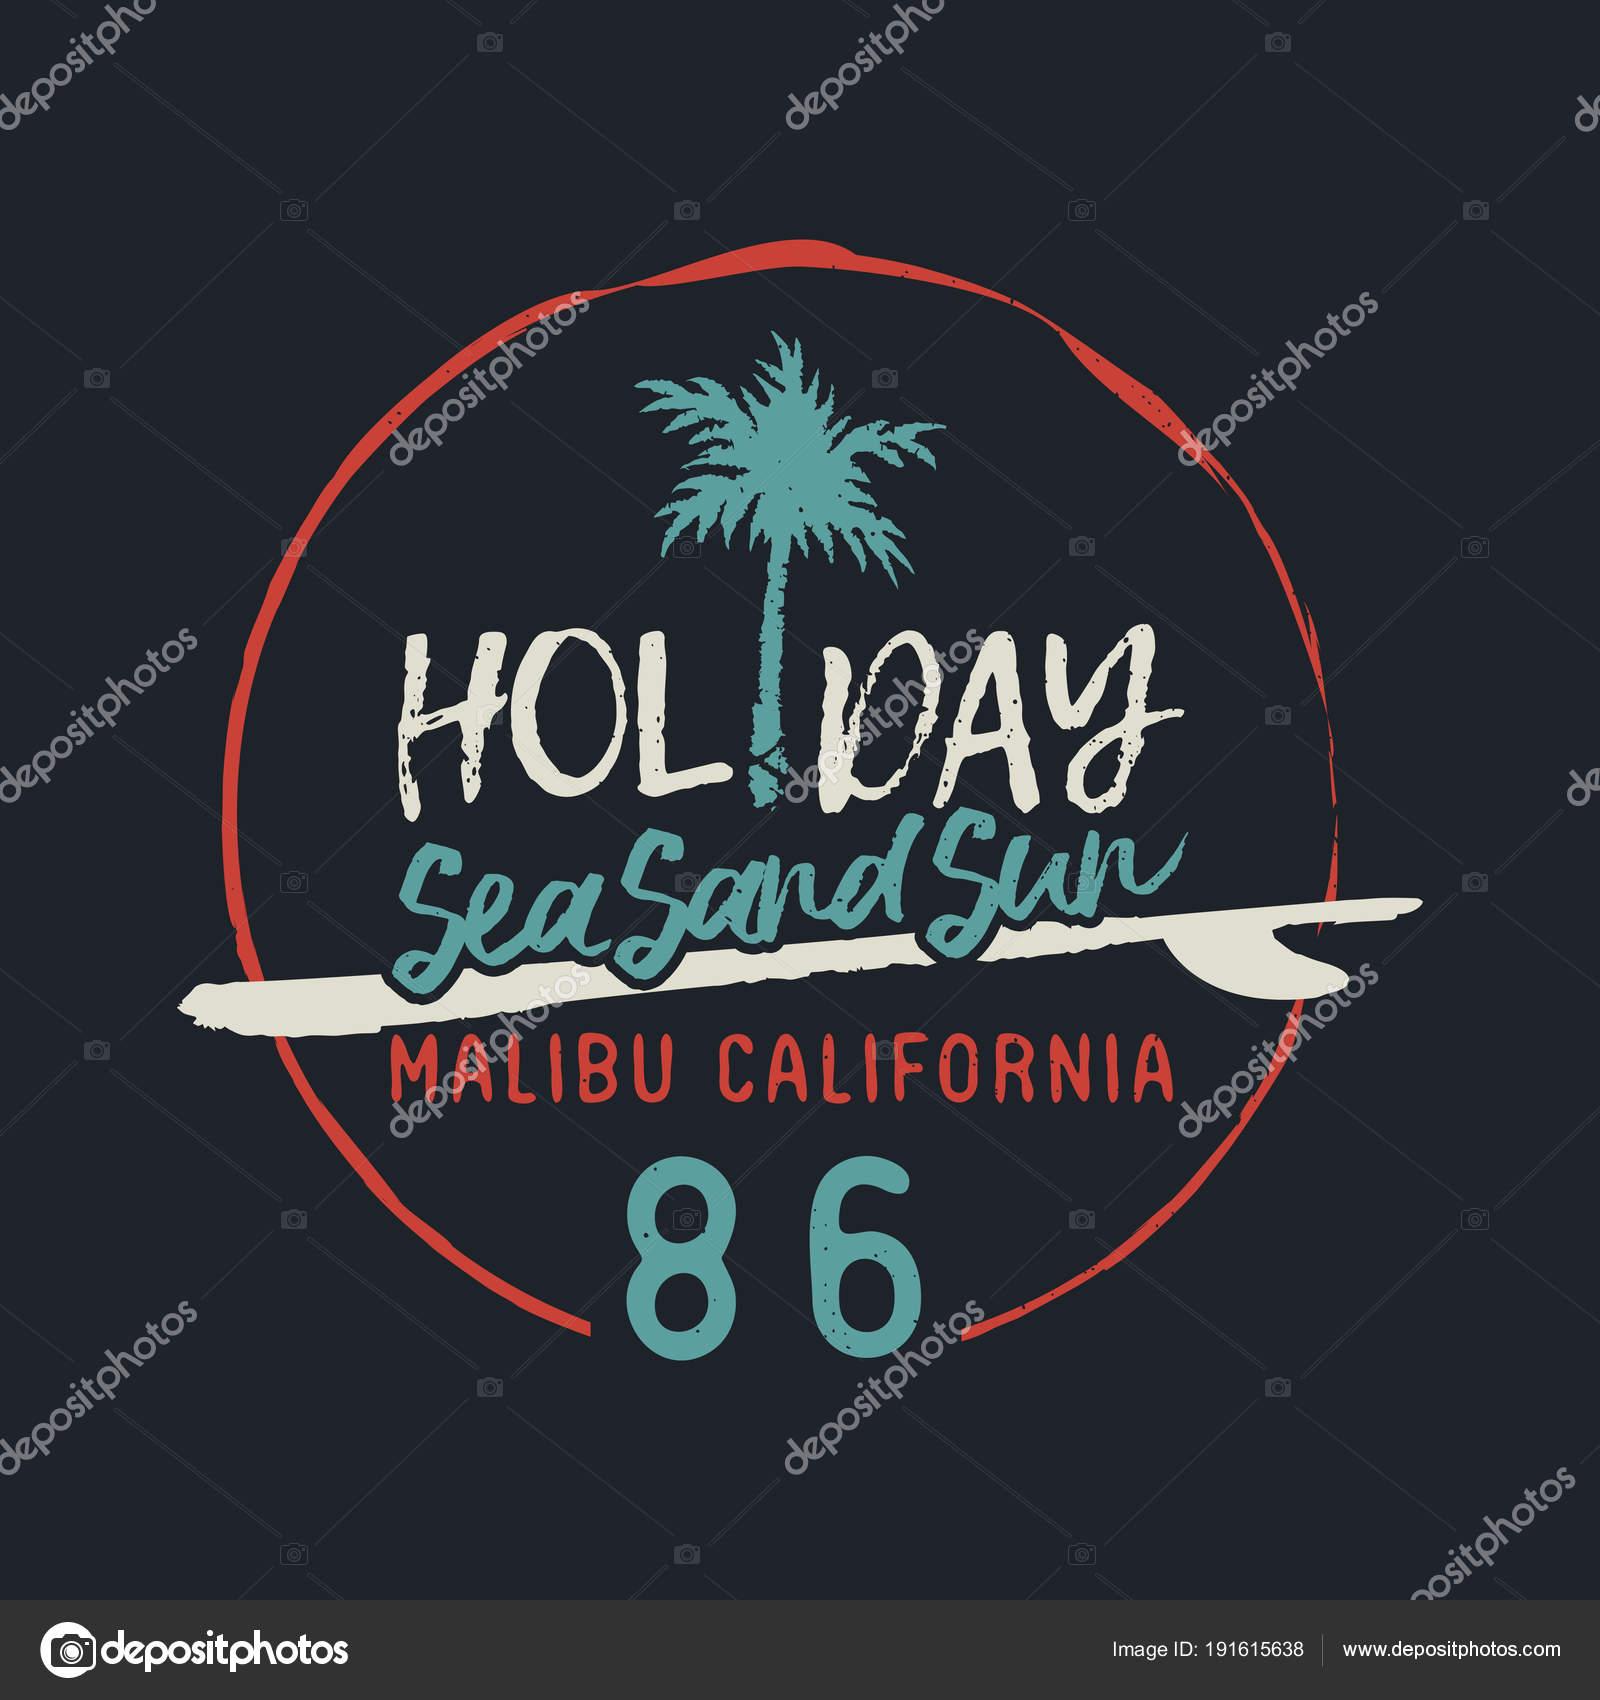 Malibu California Vintage Surf Club Text Label Stock Vector